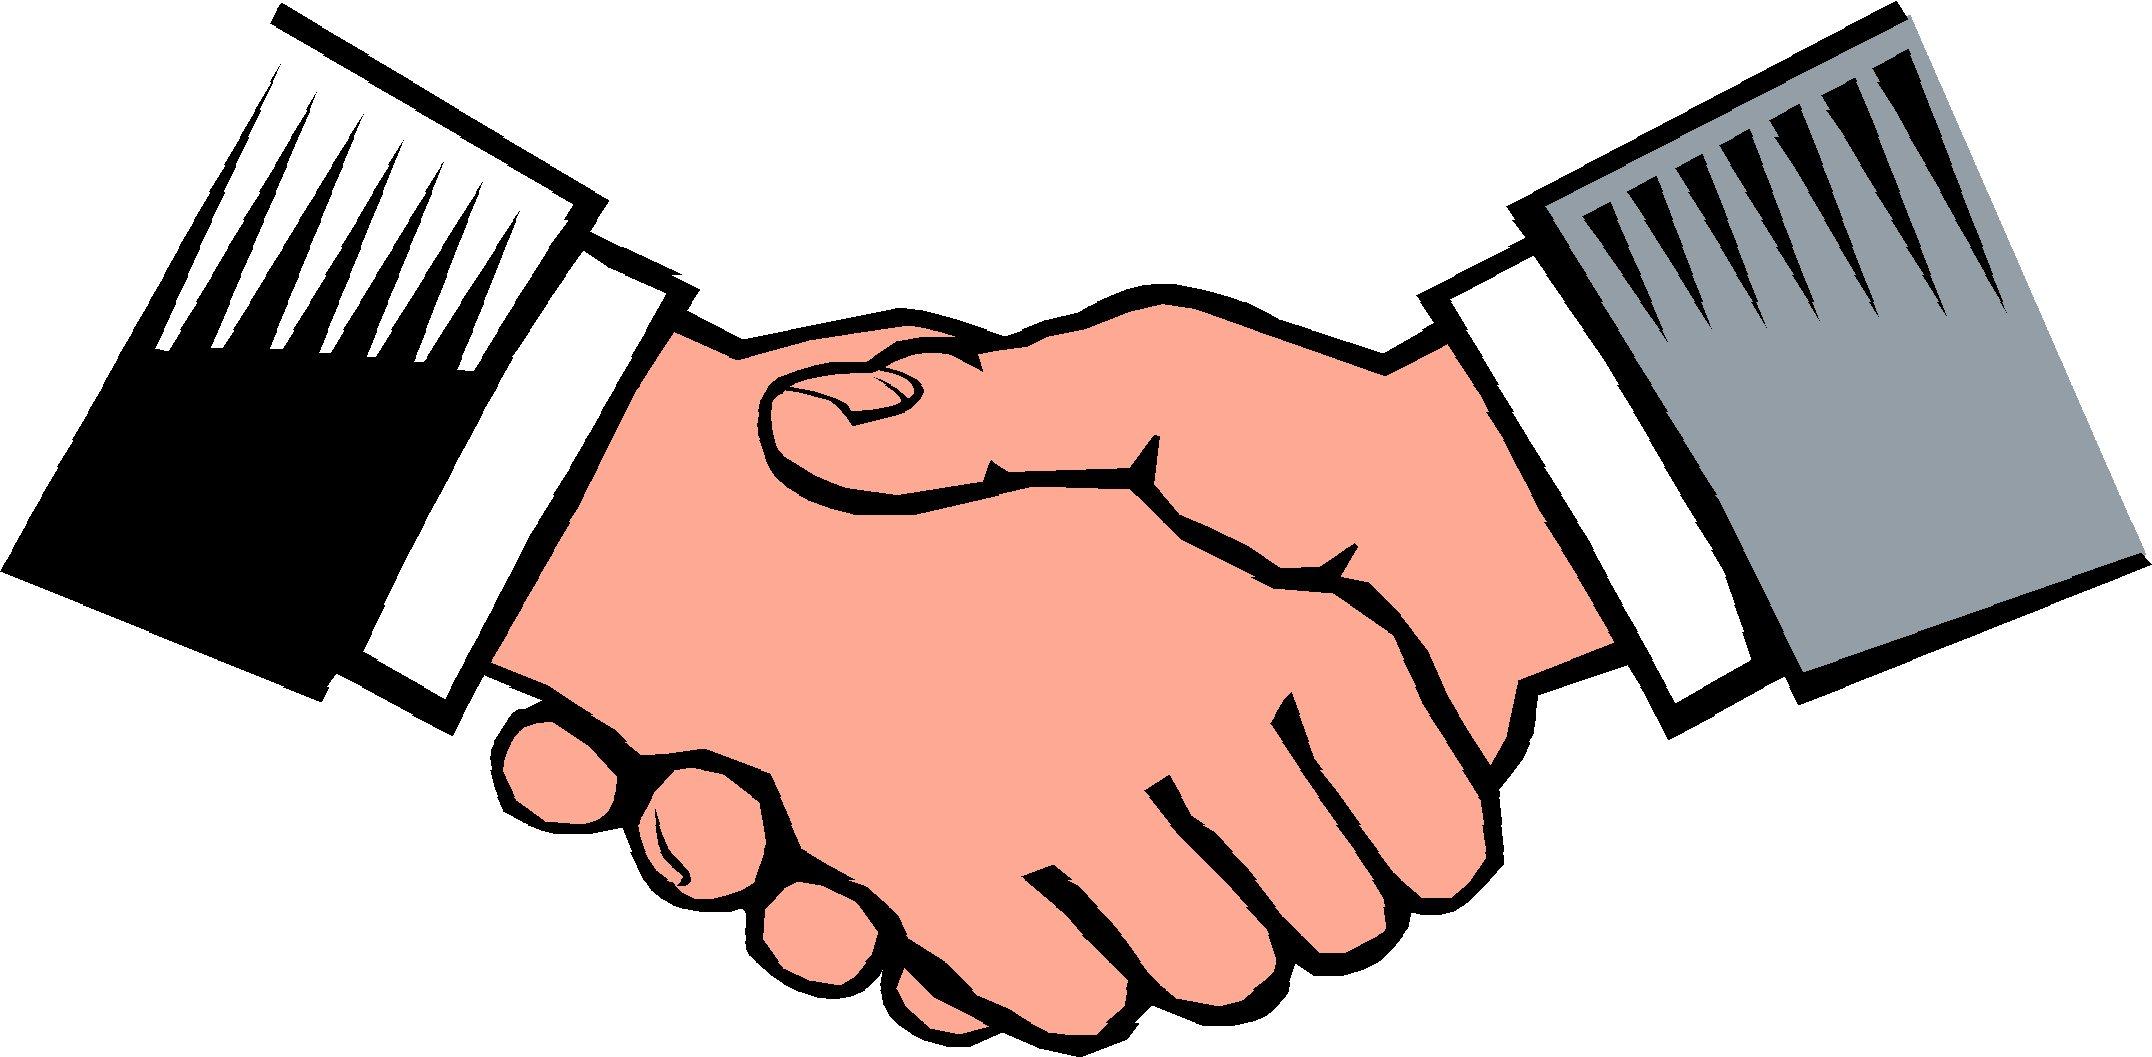 Logo clipart shake hand Free Download Free Hands Art